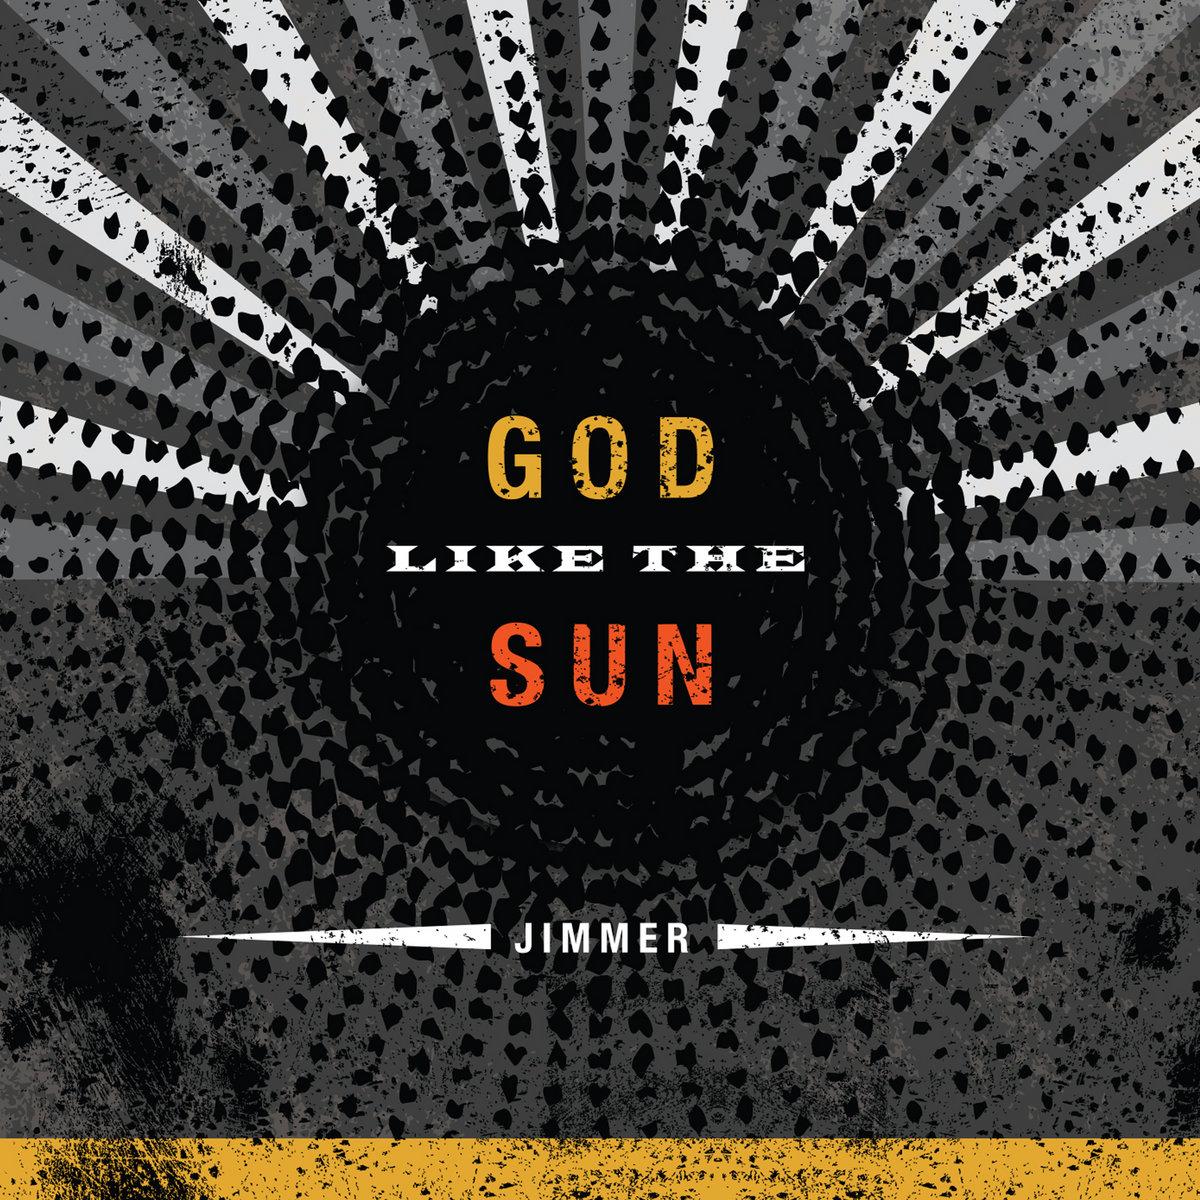 Like the sun song